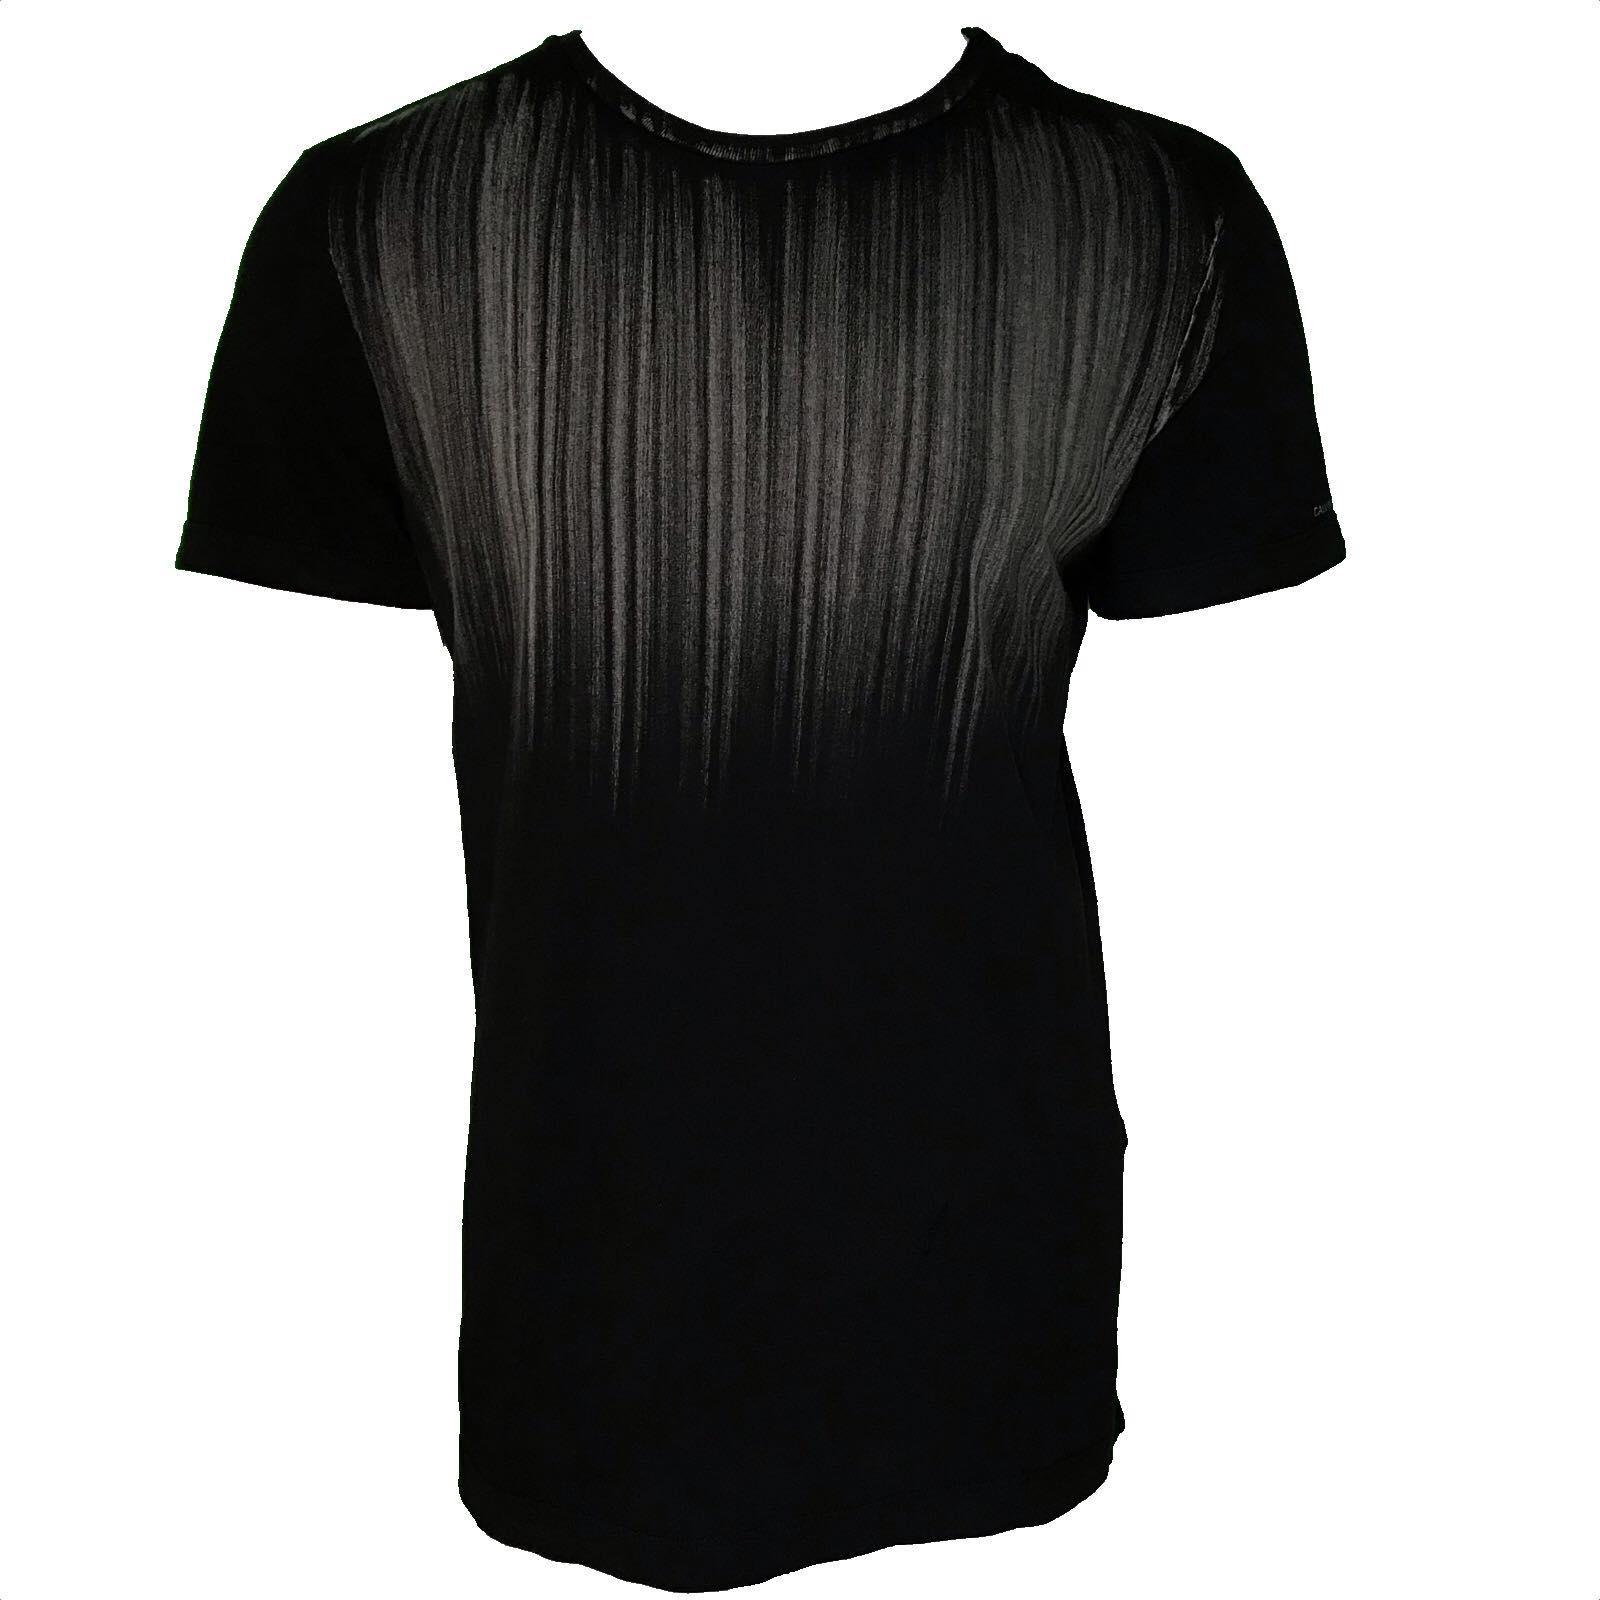 Camiseta Calvin Klein estampada